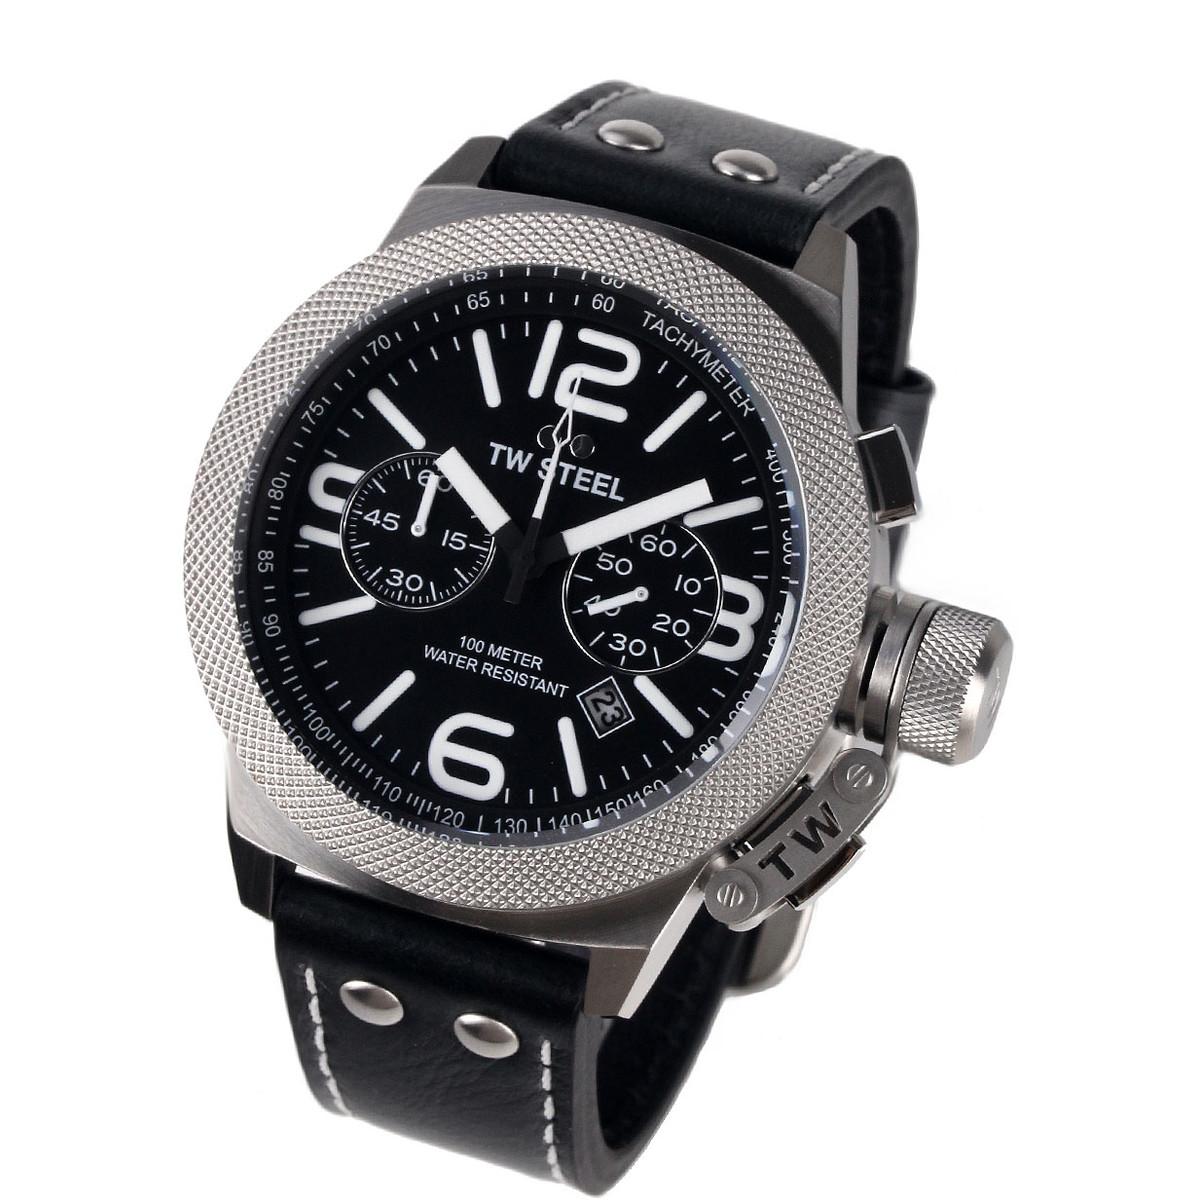 Ceas barbatesc TW-Steel CS4 Canteen Leather Chronograph original la pret mic